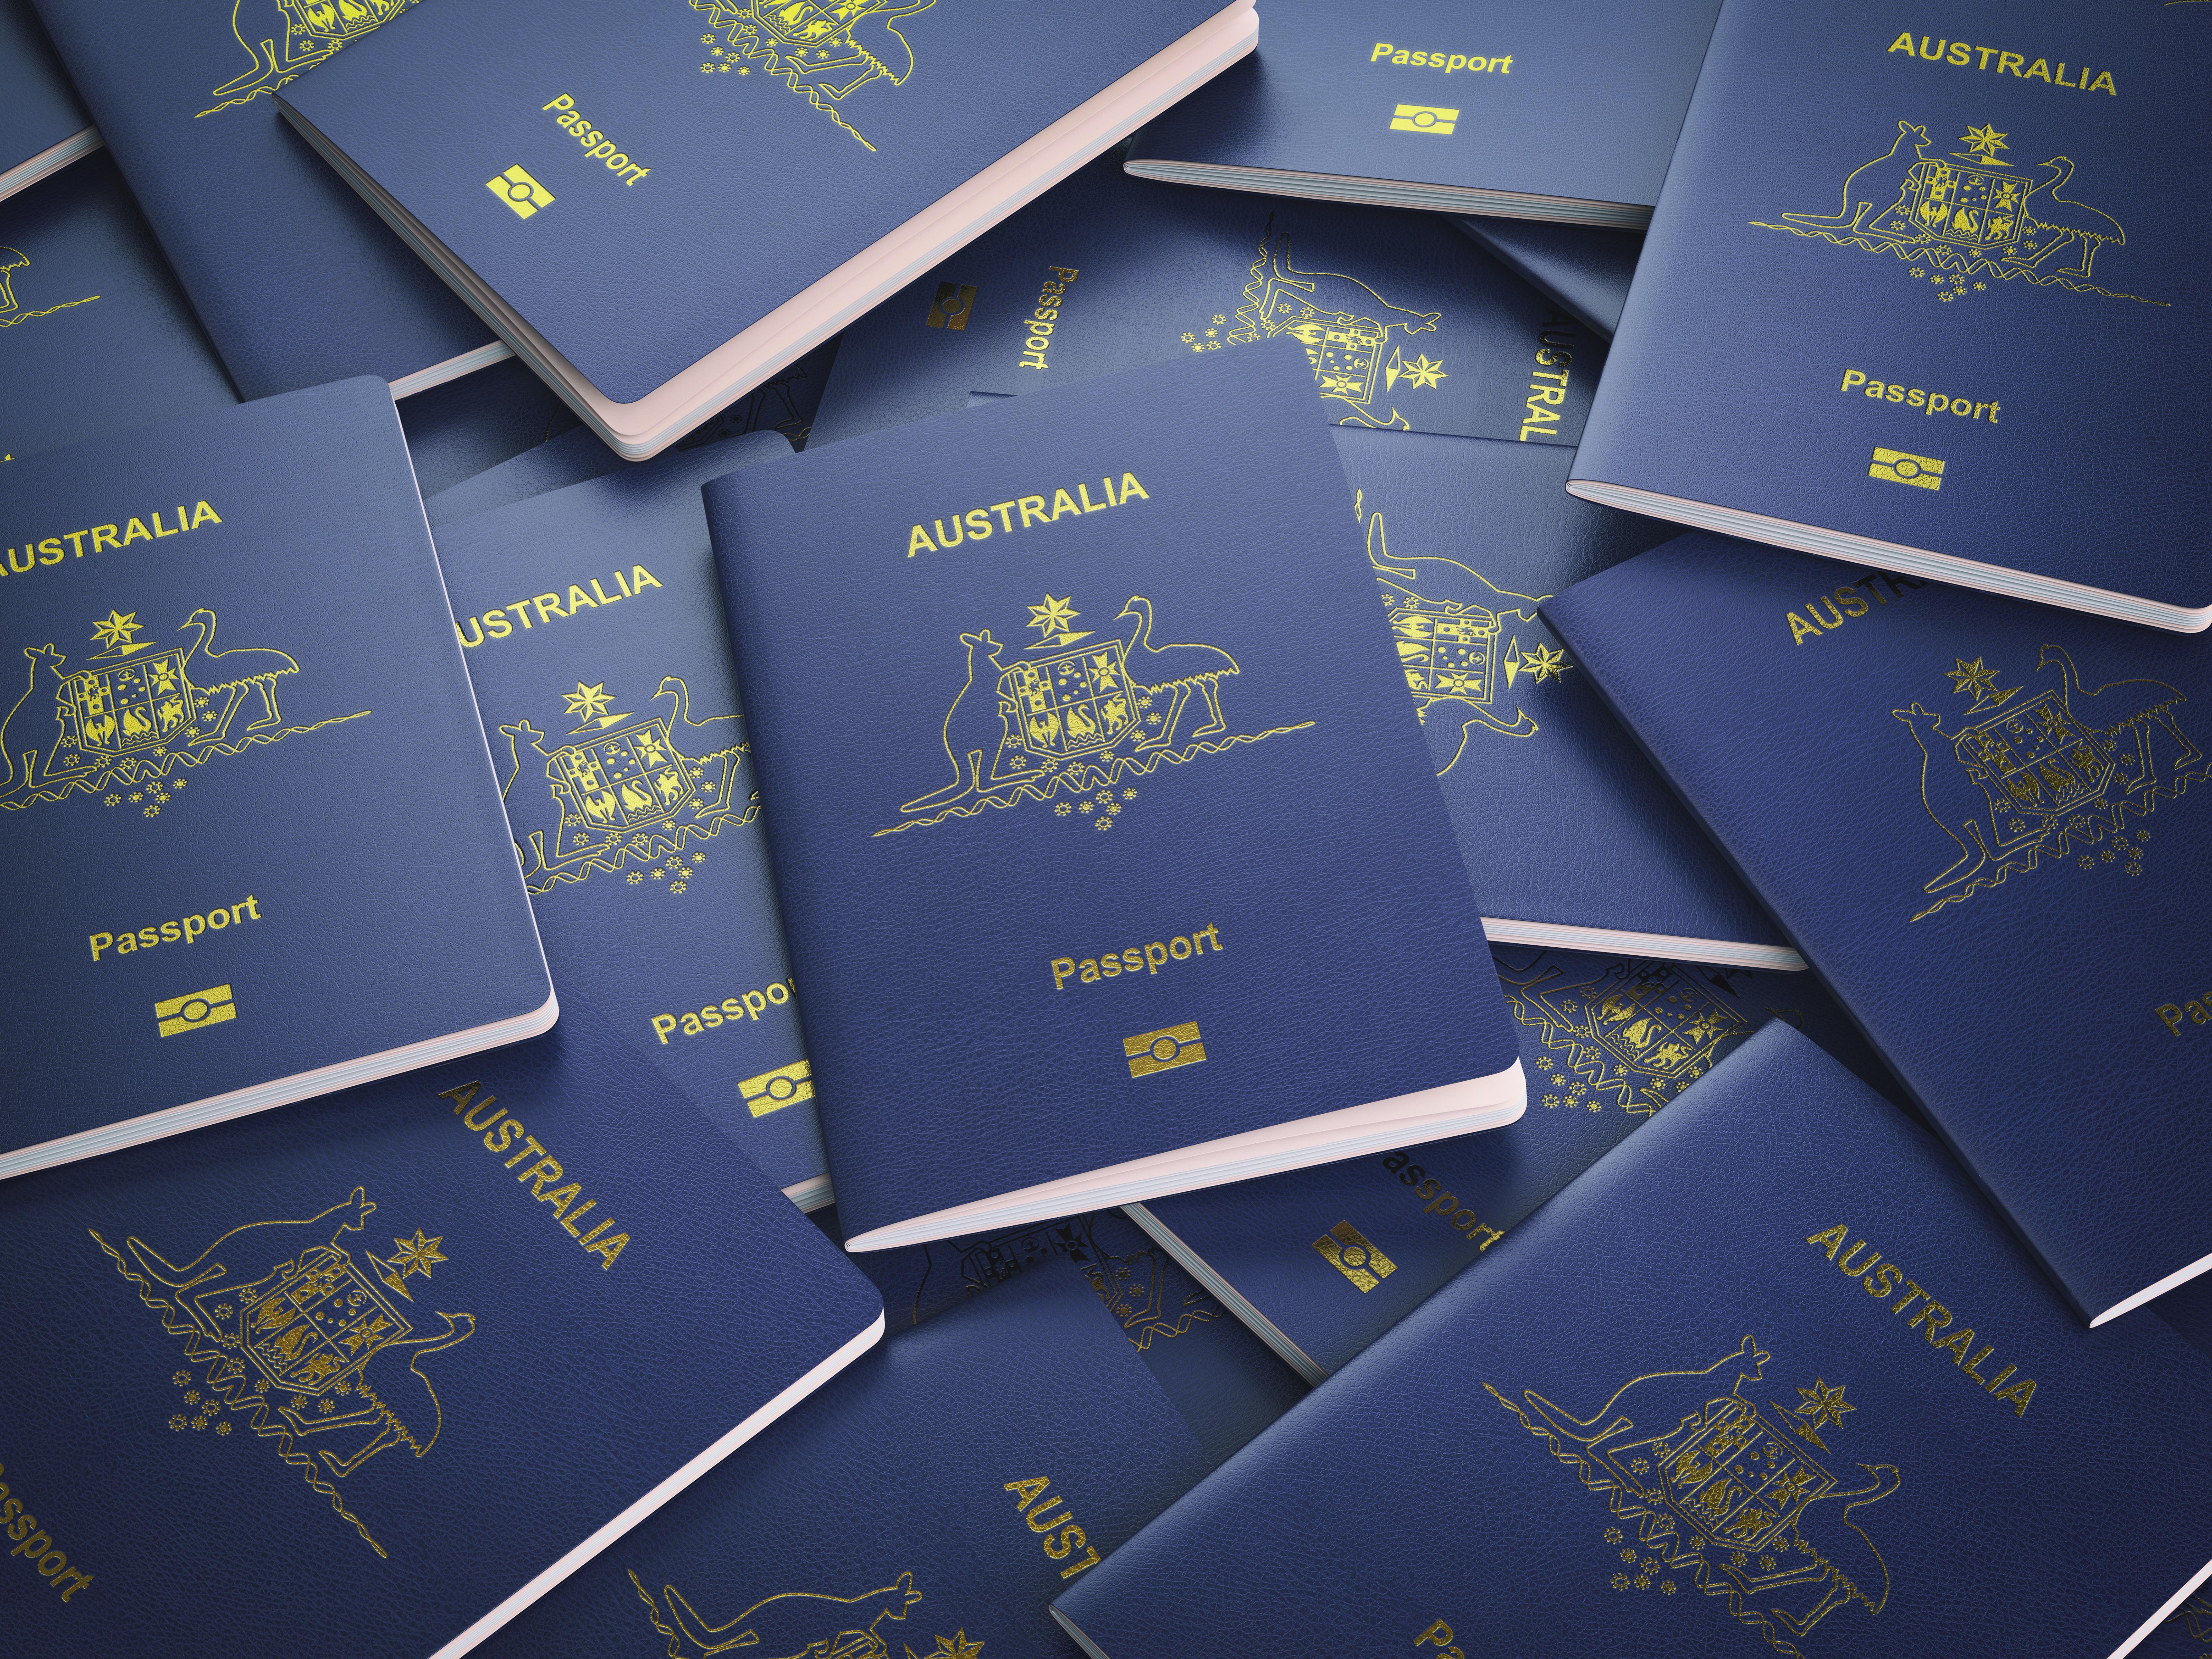 NSW occupation lists